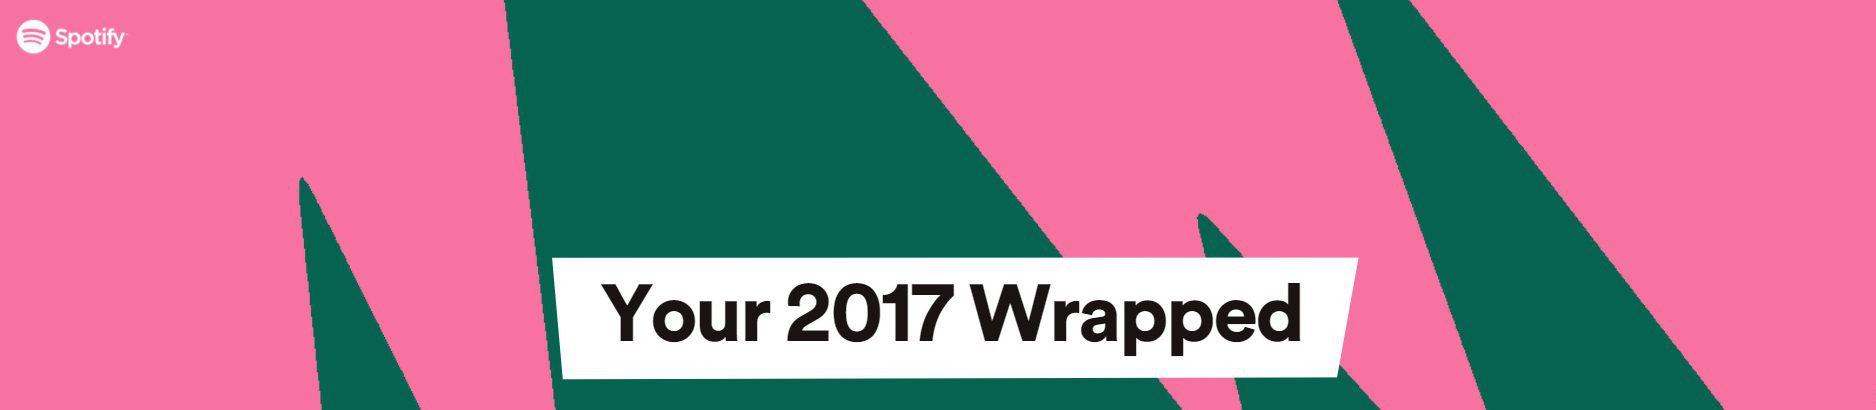 spotify wrapped 2018